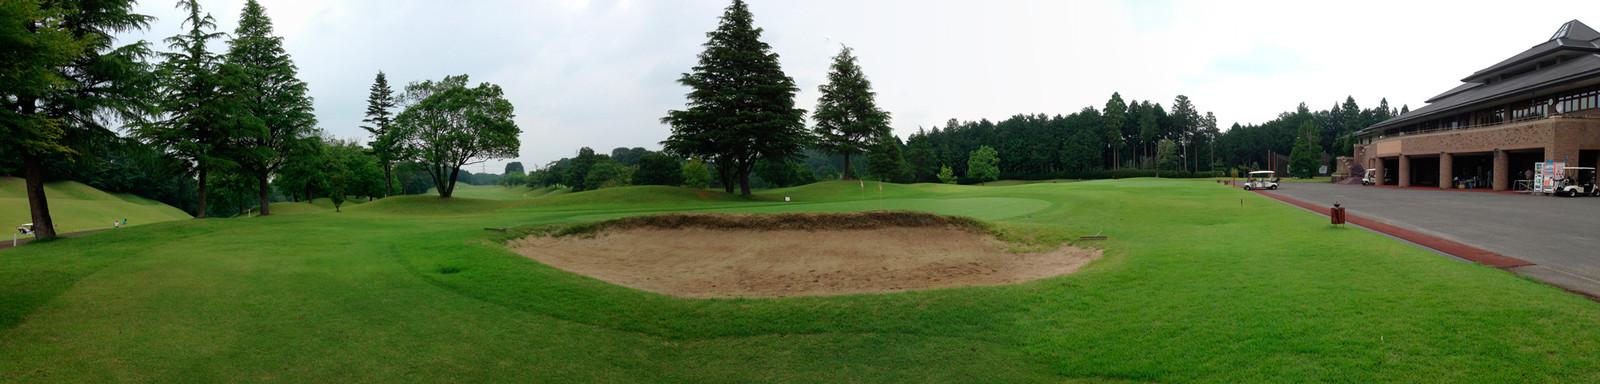 20140621_golf